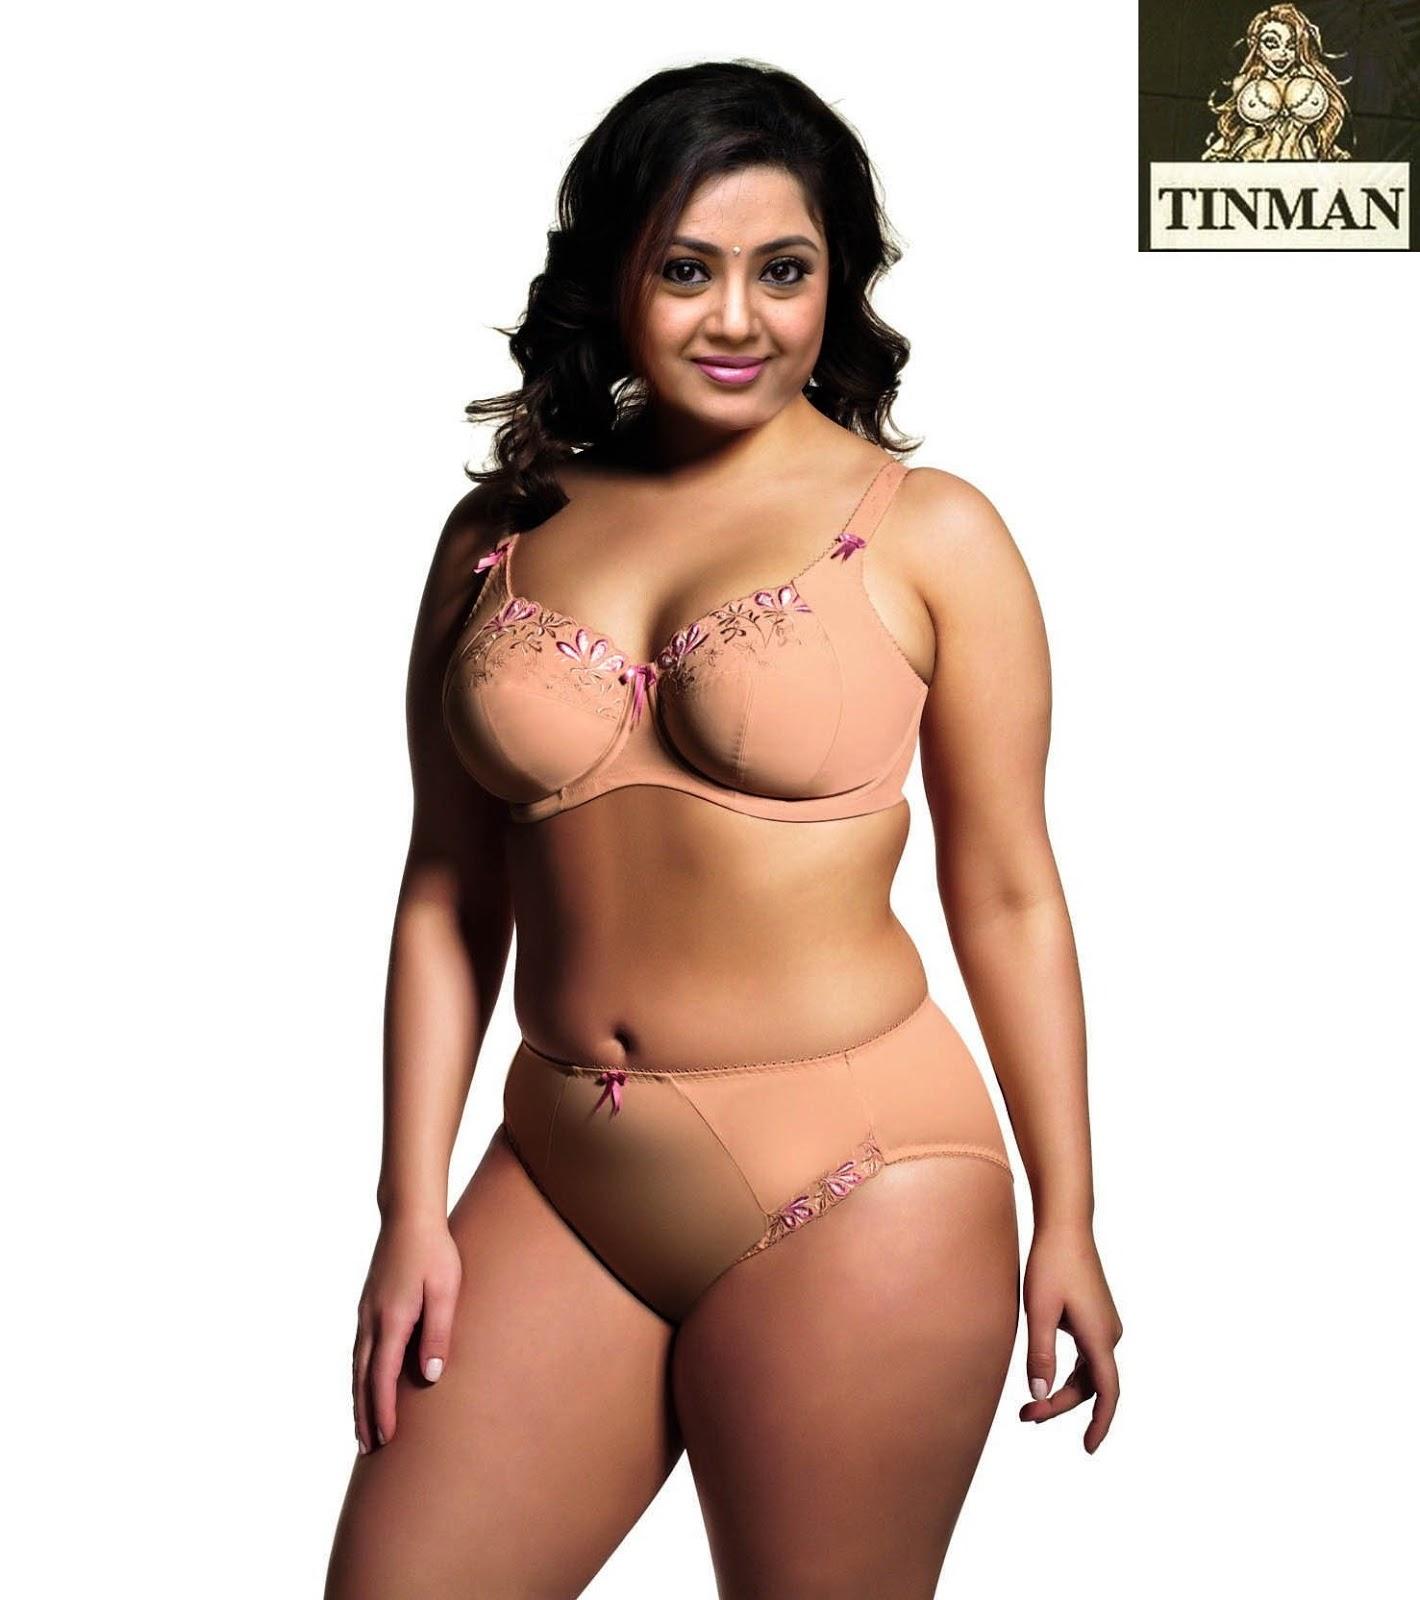 meena fake nude photos